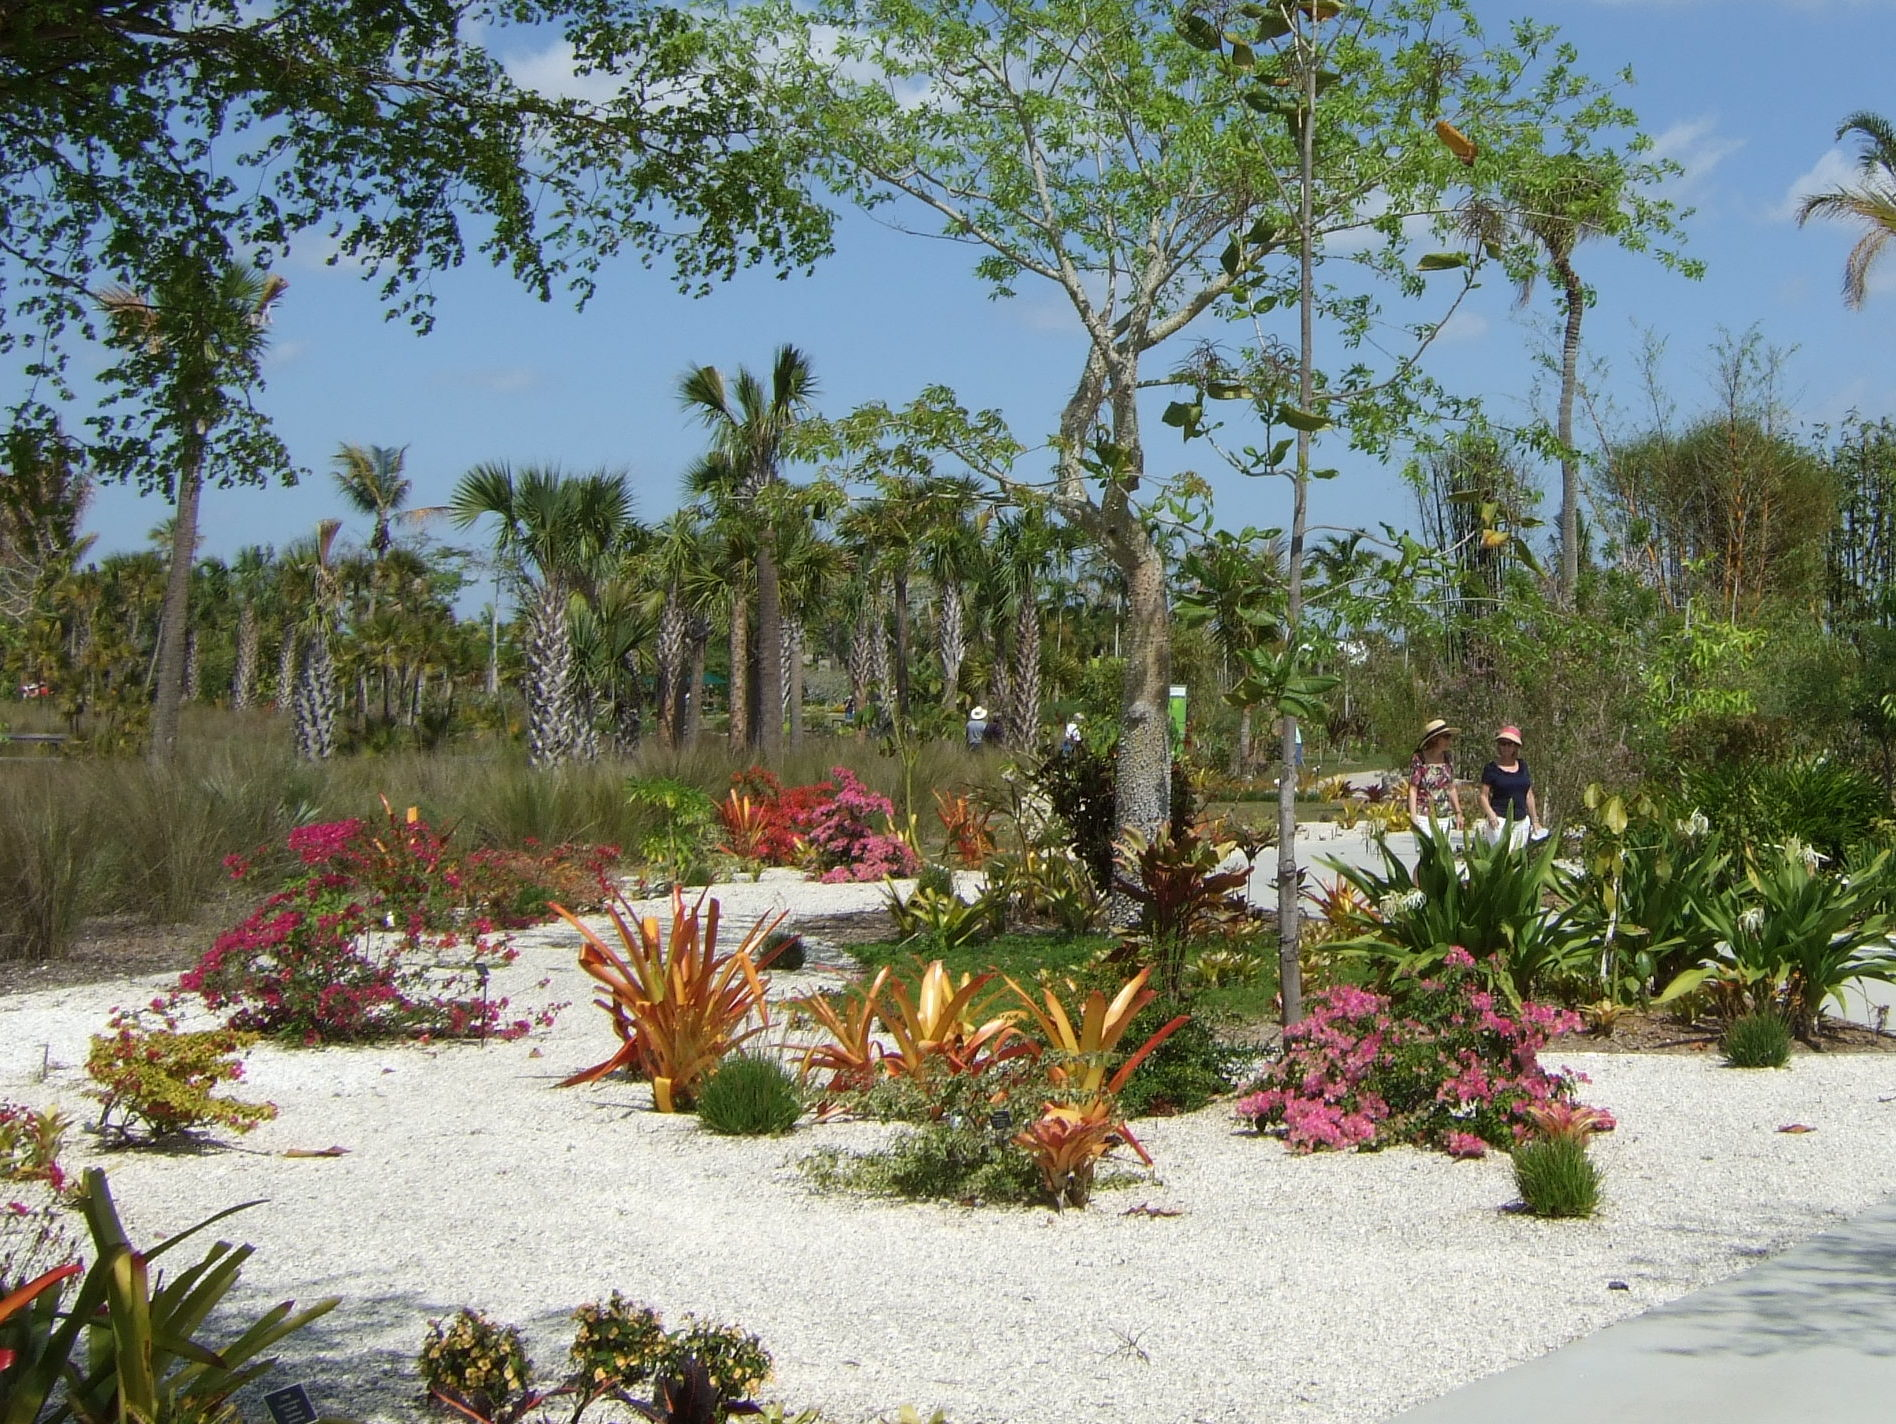 Bromeliads and limestone walk in Naples Botanical Garden